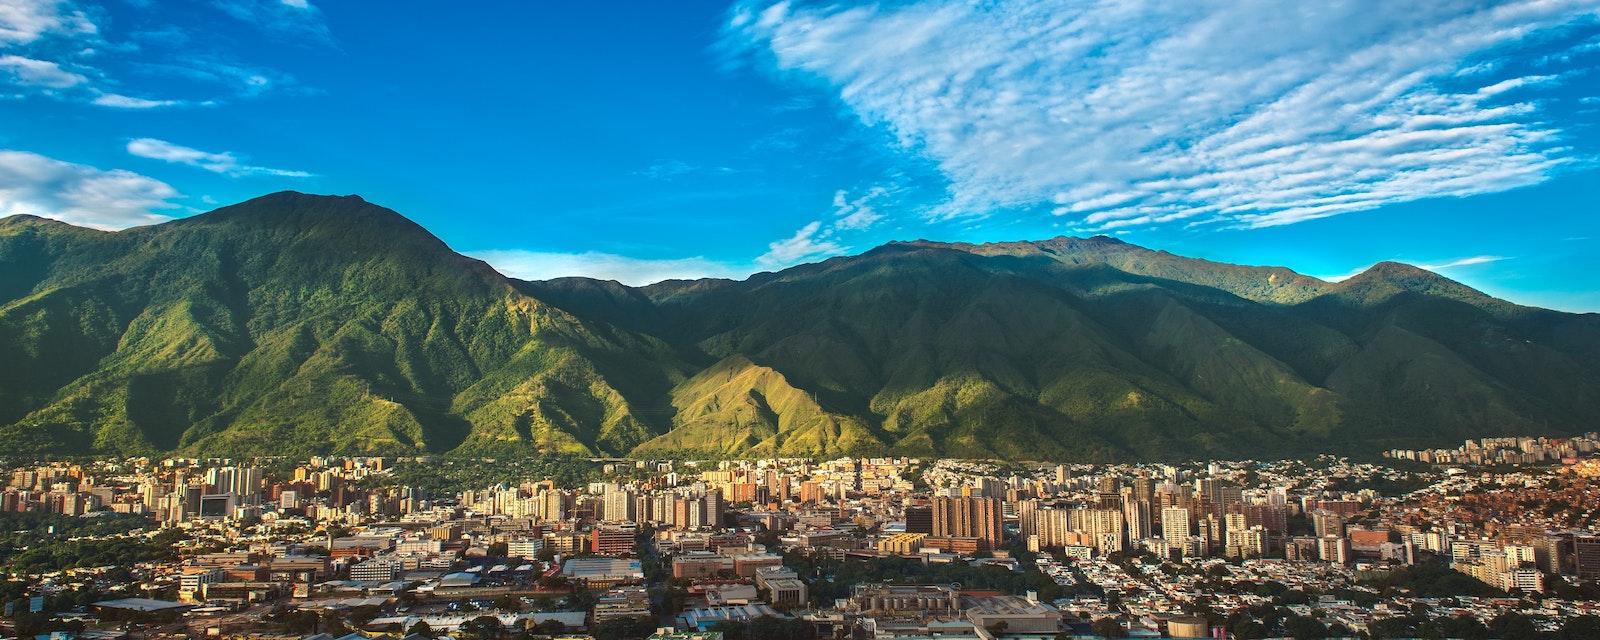 City,Of,Caracas,On,A,Vibrant,Day